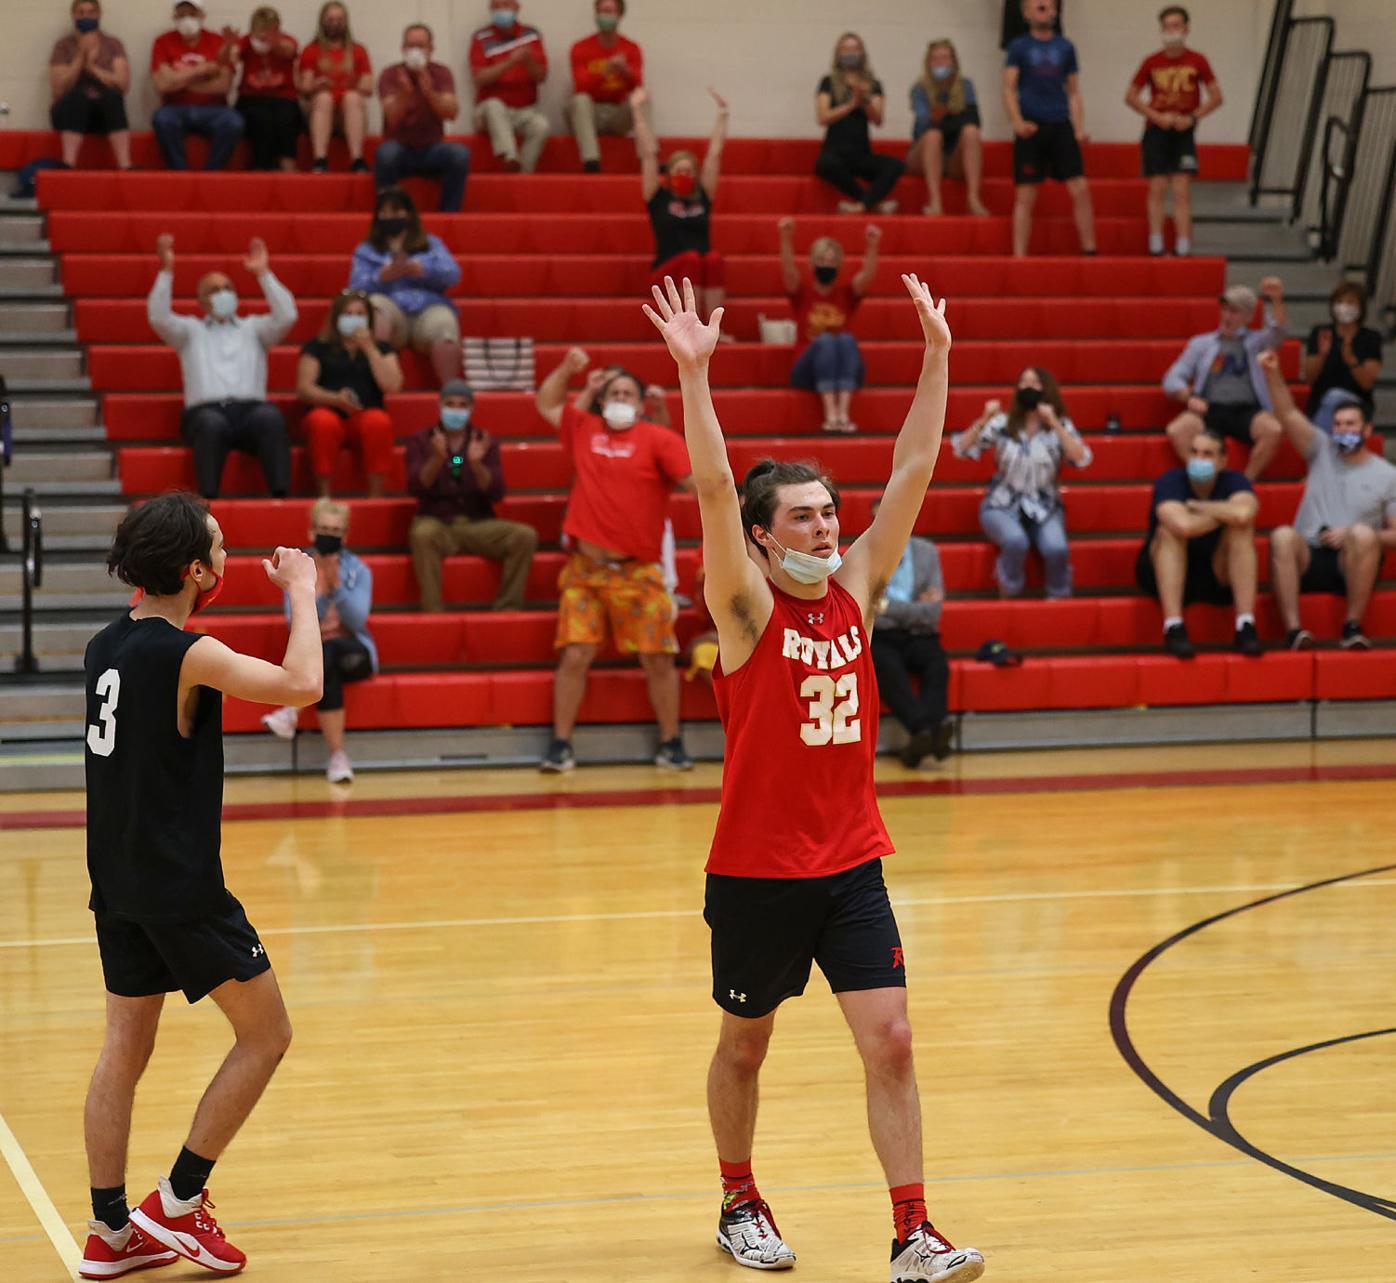 District II Boys Volleyball Subregional AA Championship: Holy Redeemer vs Dock Mennonite Academy